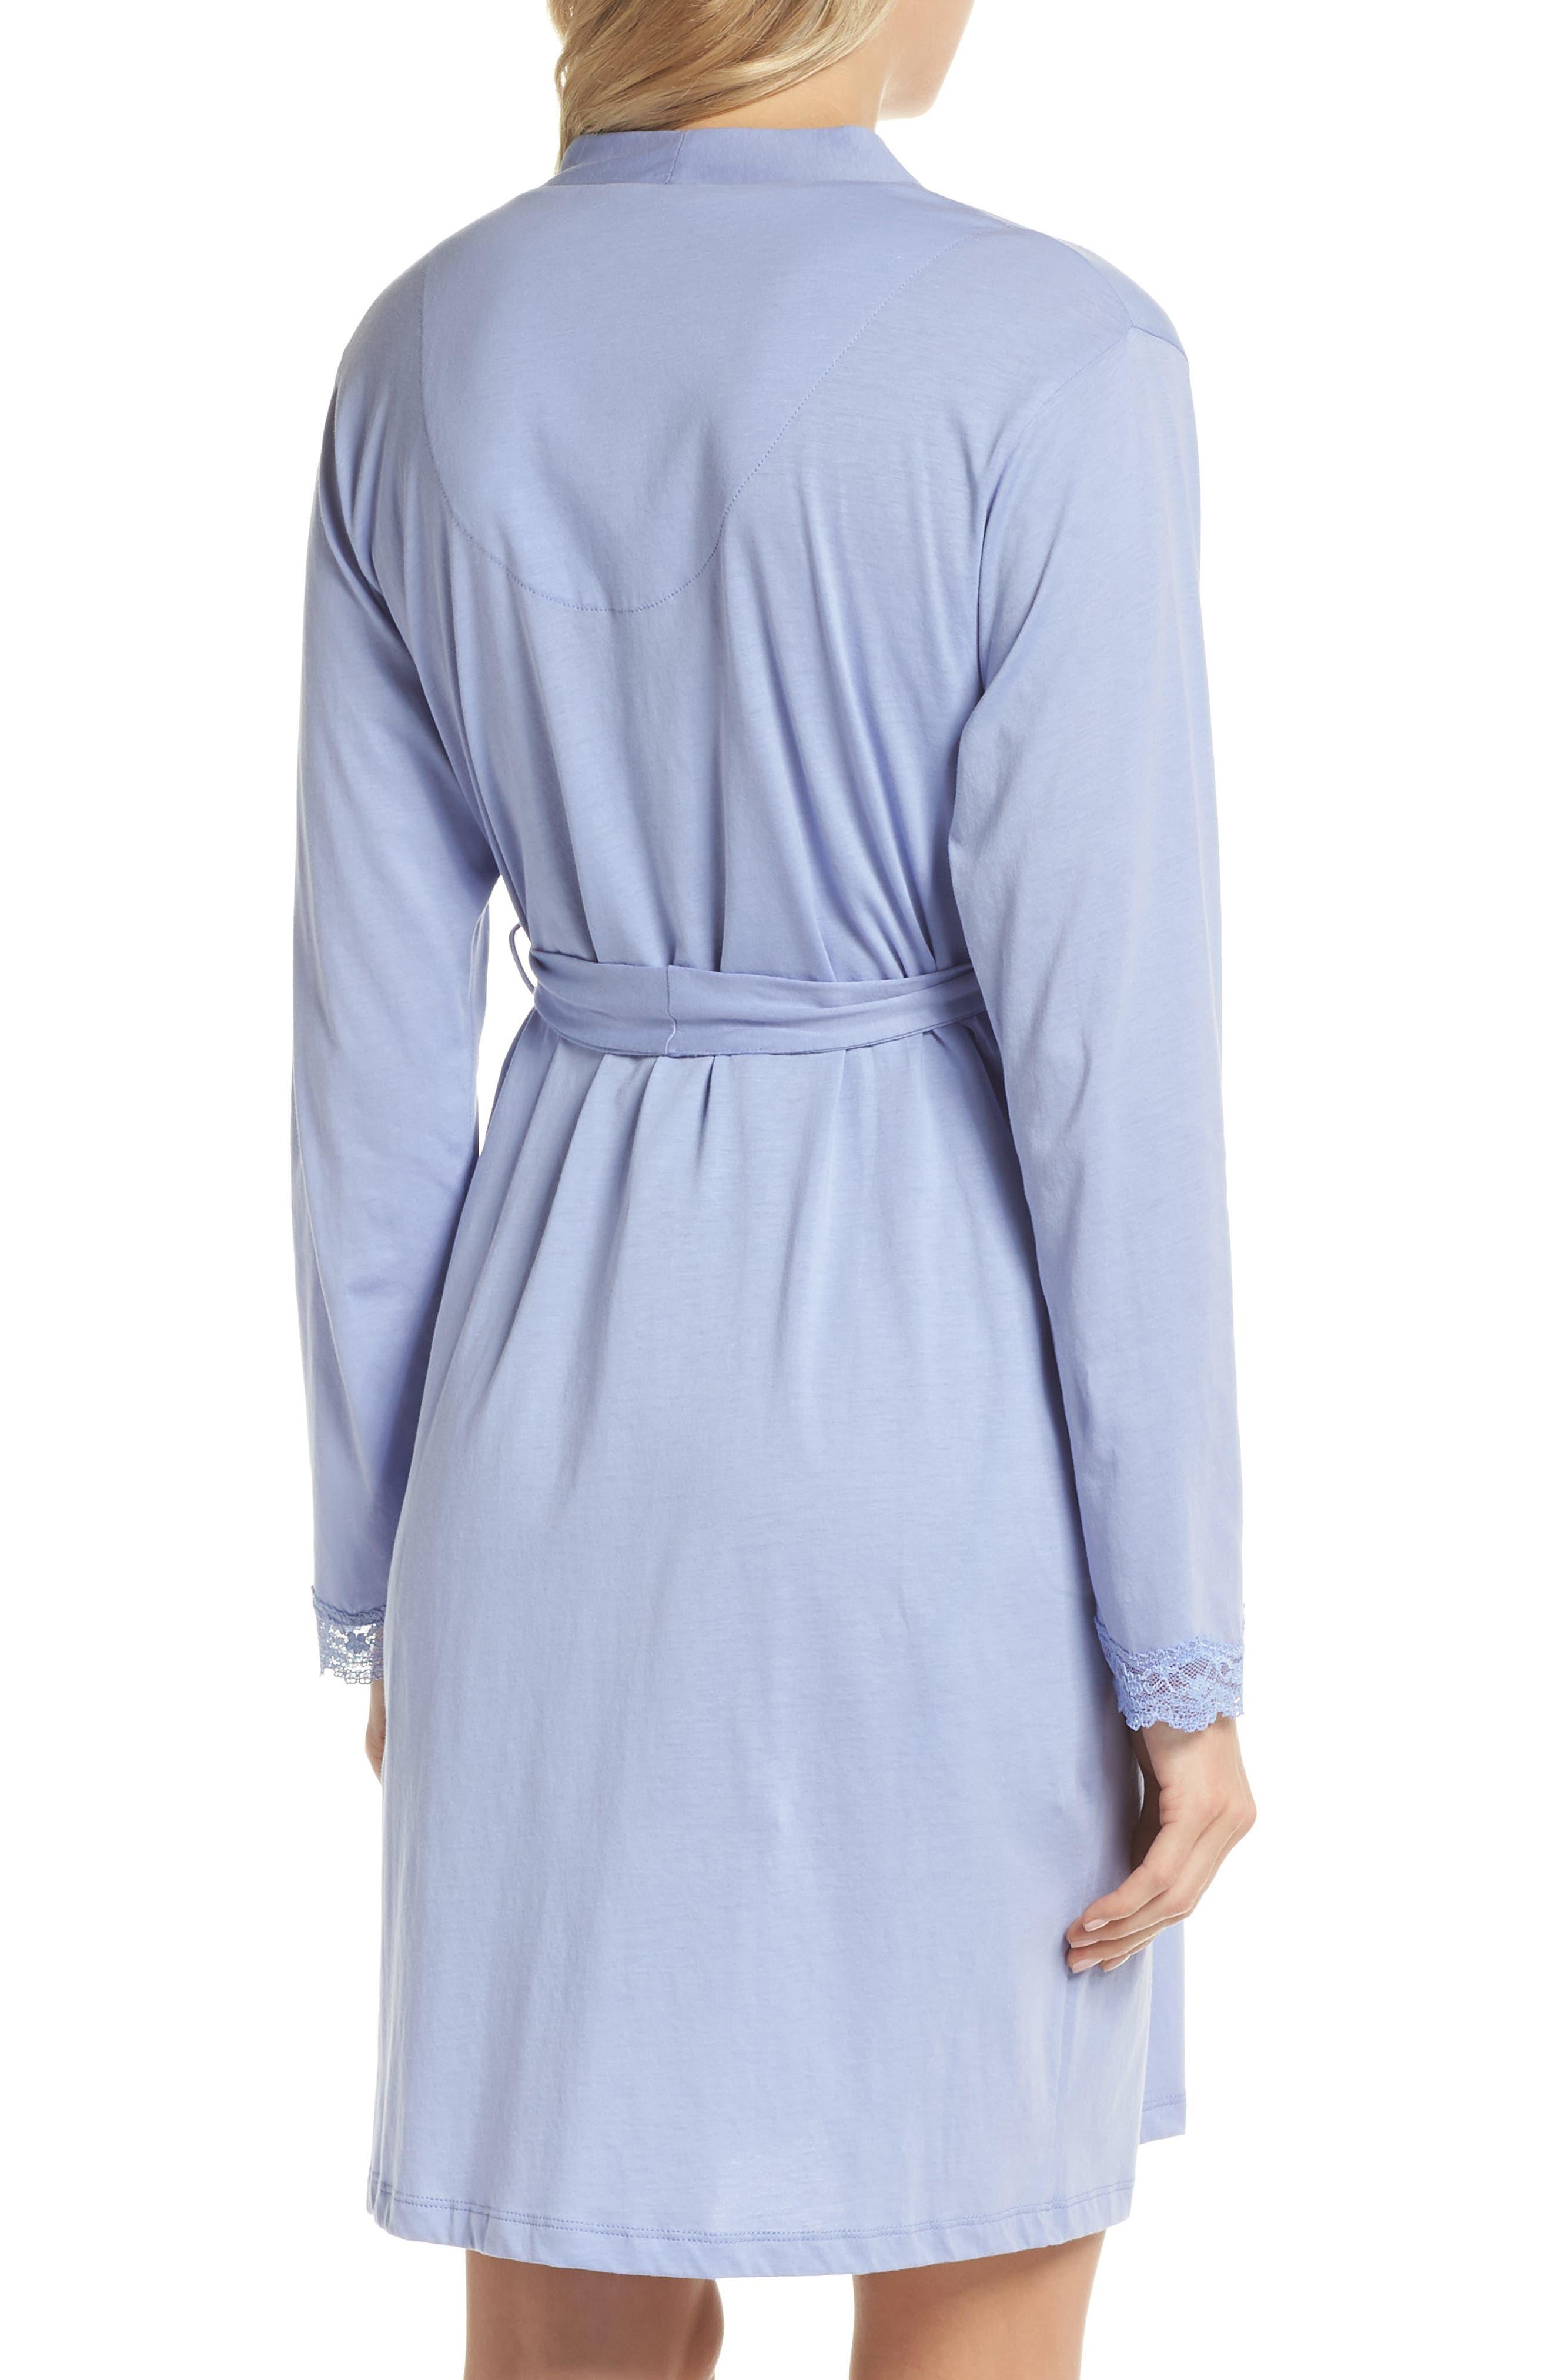 Violette Maternity/Nursing Robe,                             Alternate thumbnail 2, color,                             PURPLE